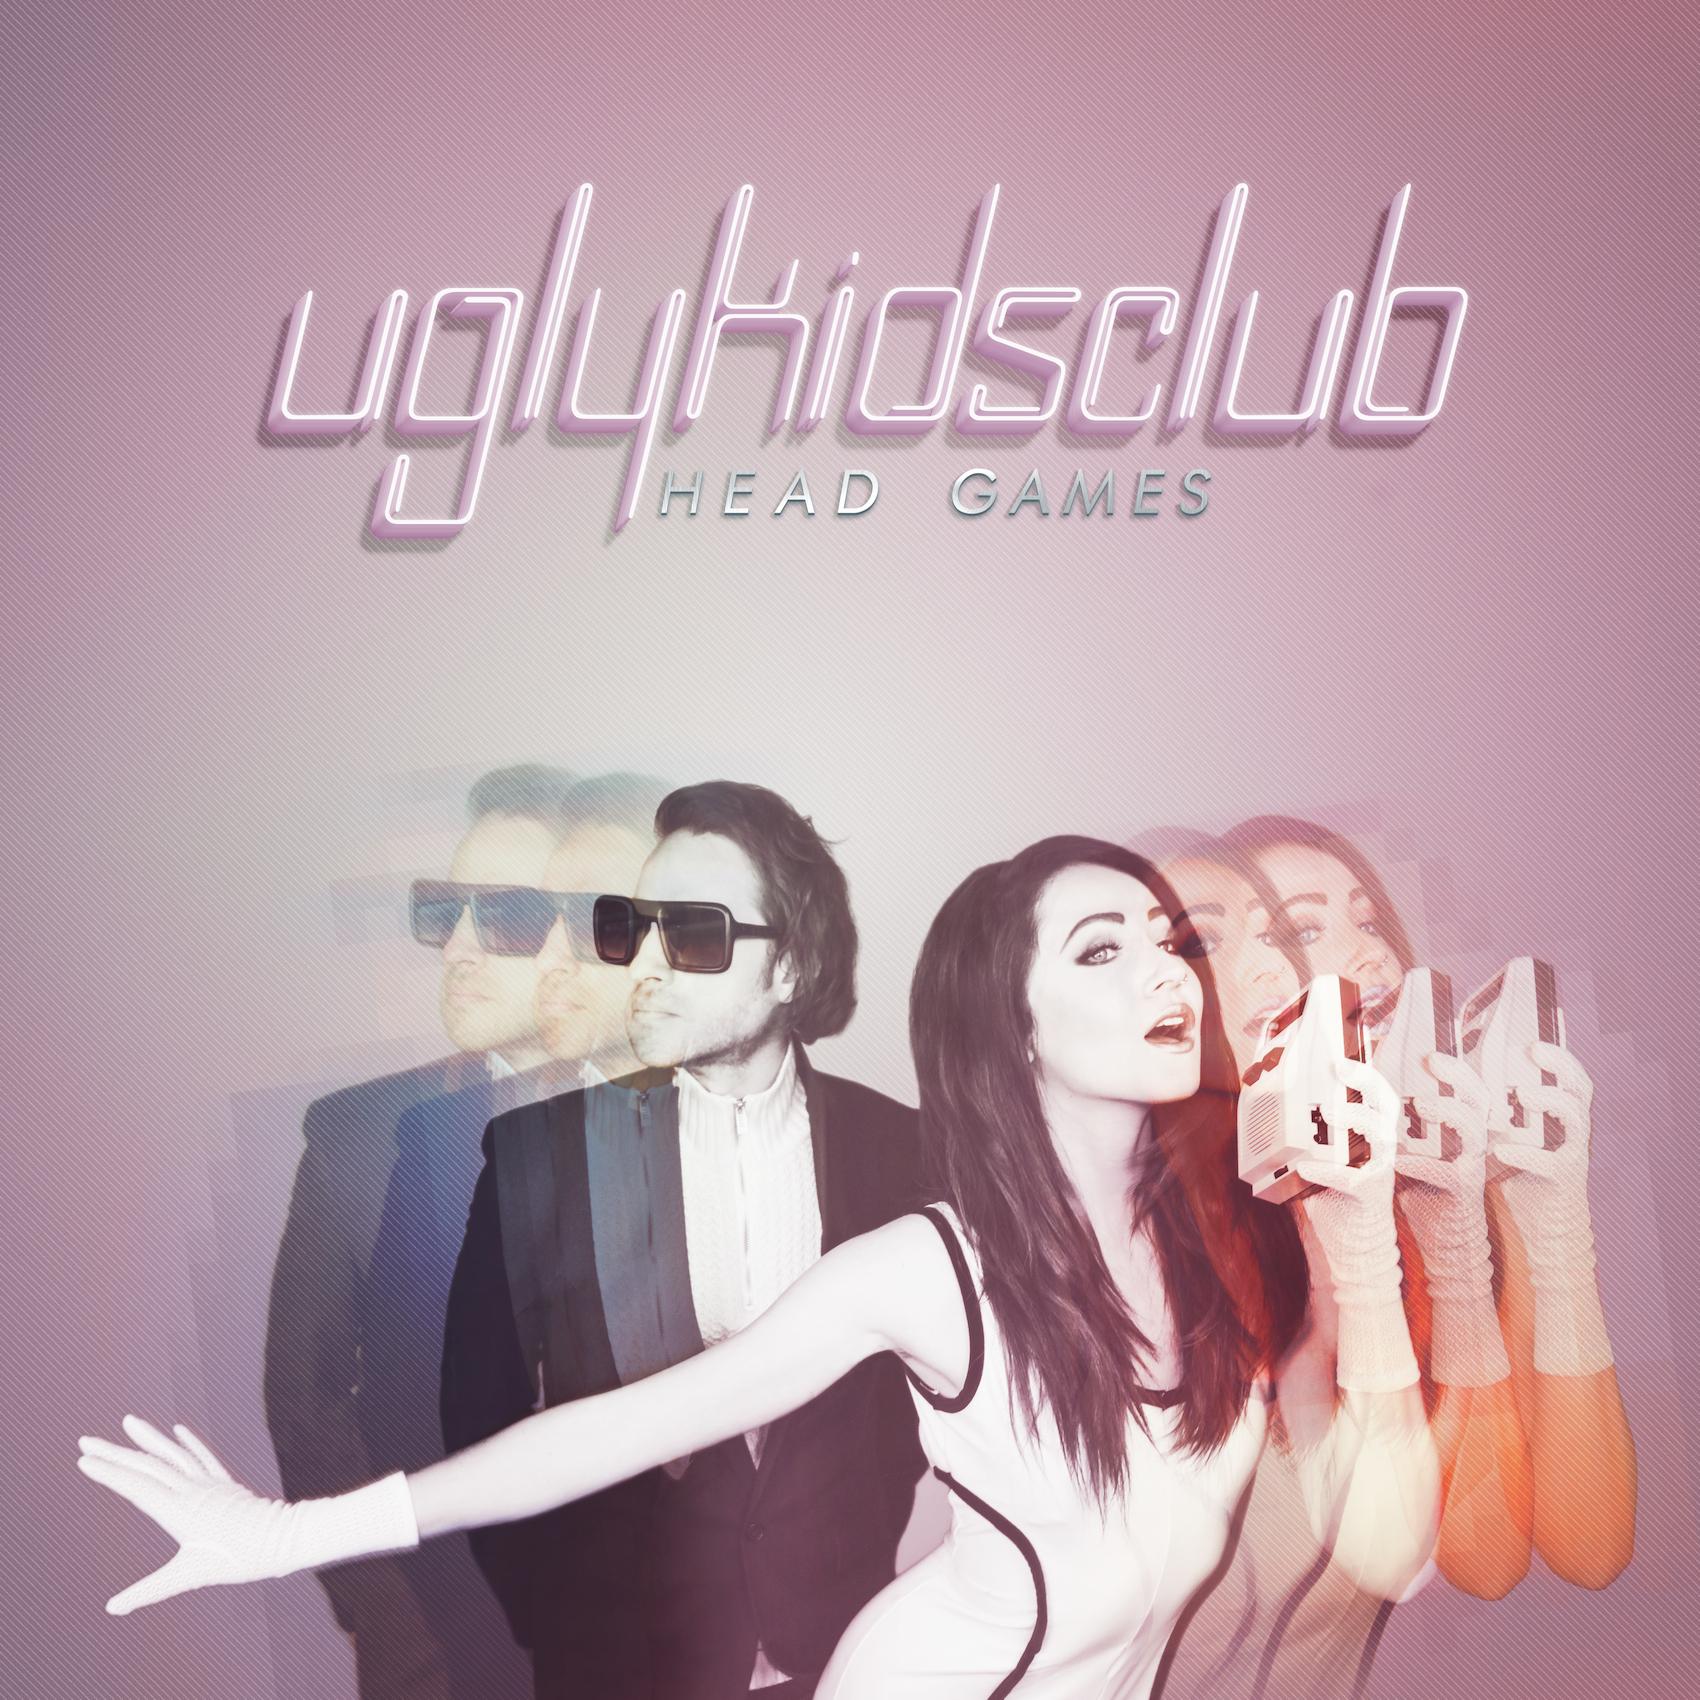 Ugly kids club - Head games